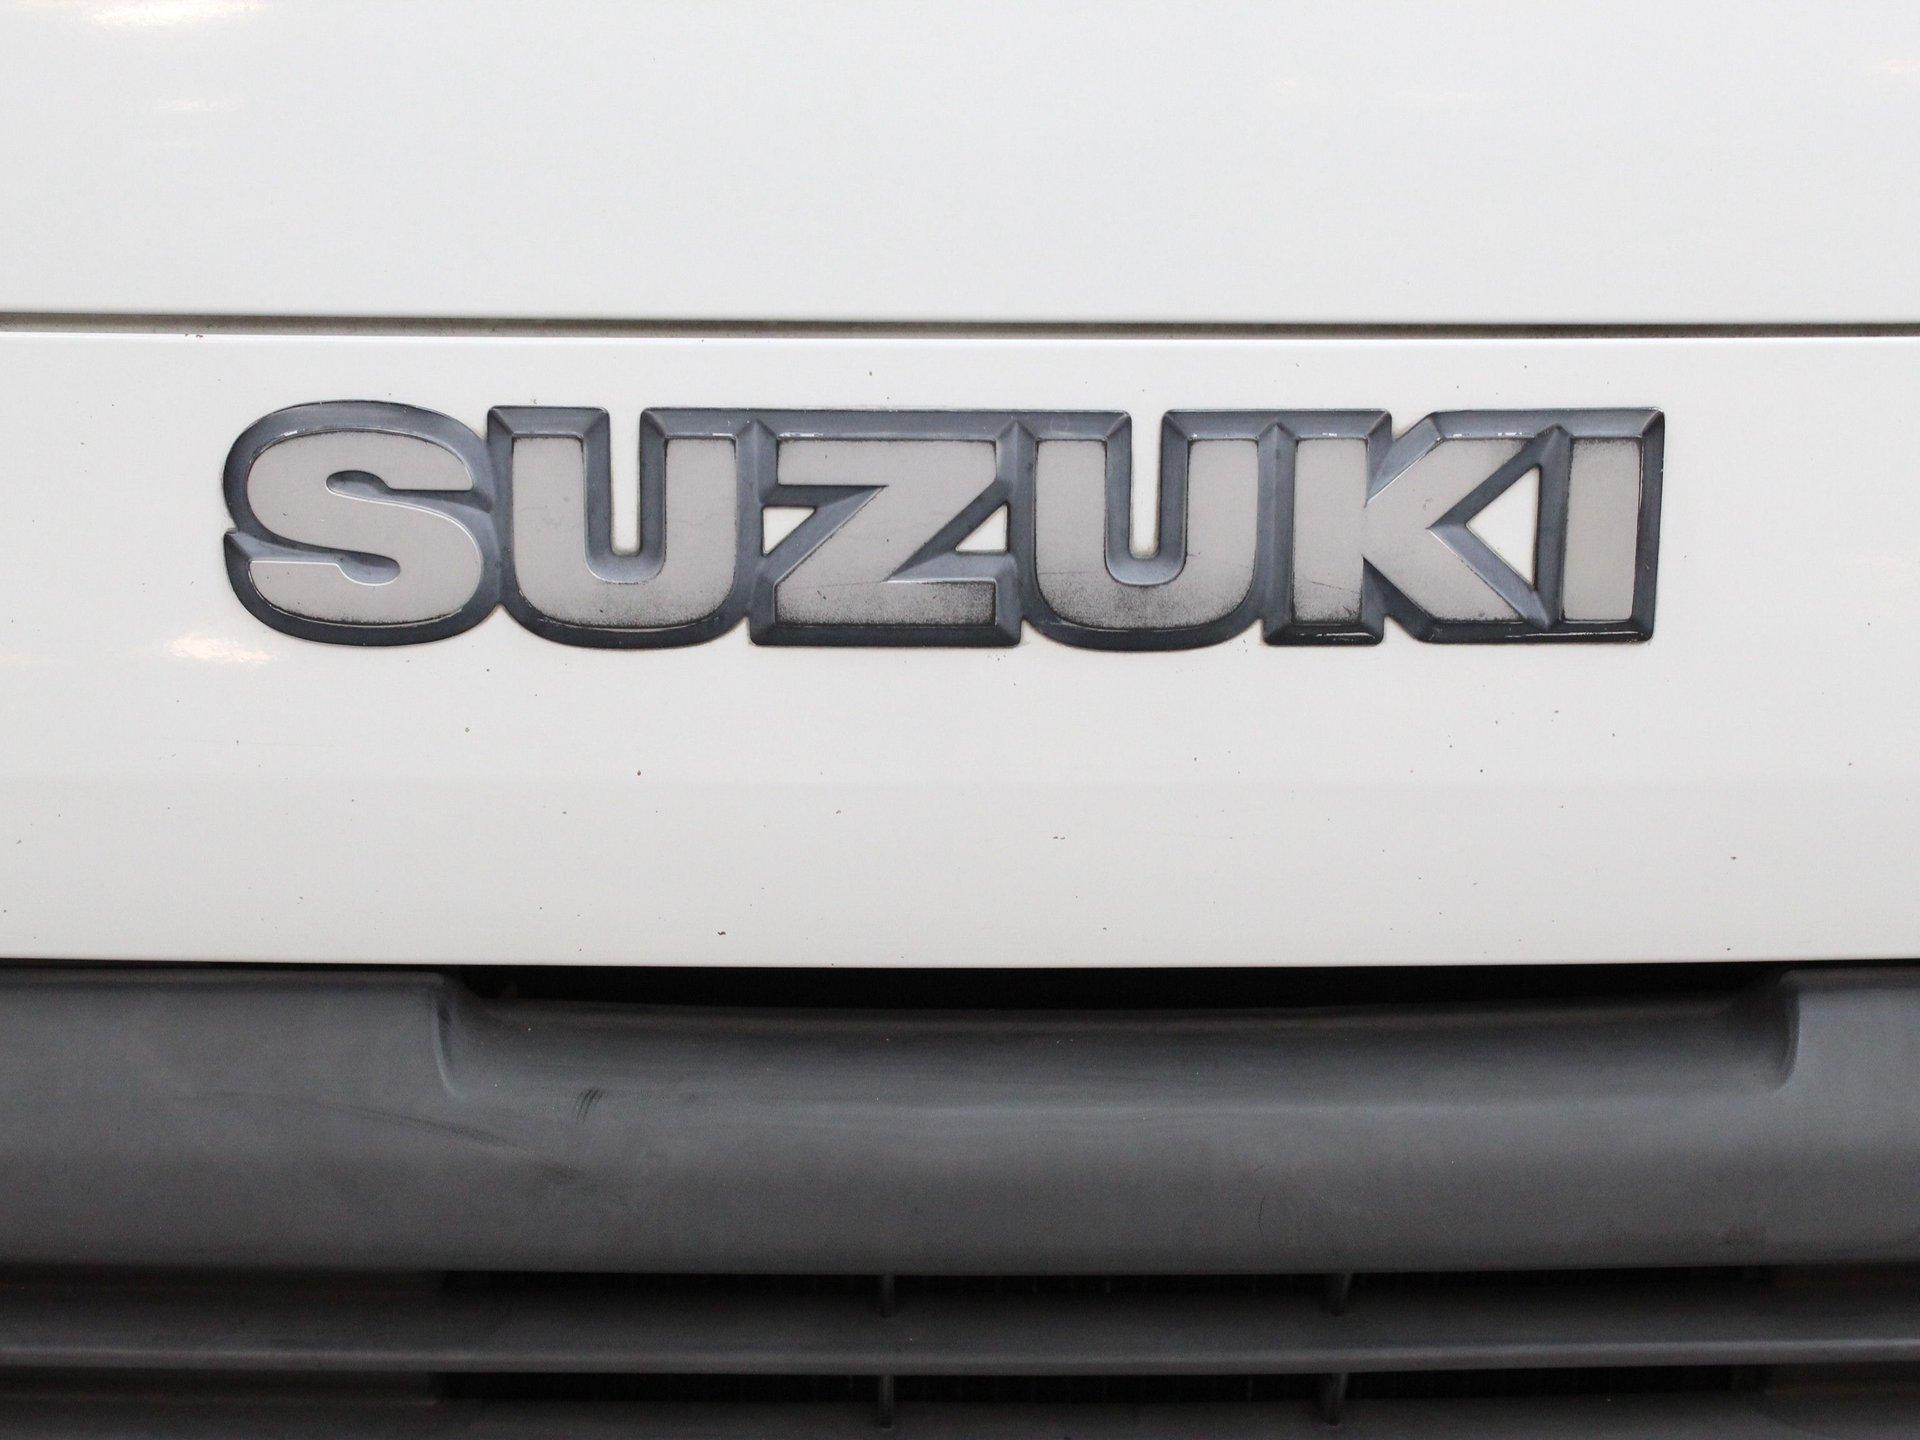 1992 Suzuki Carry